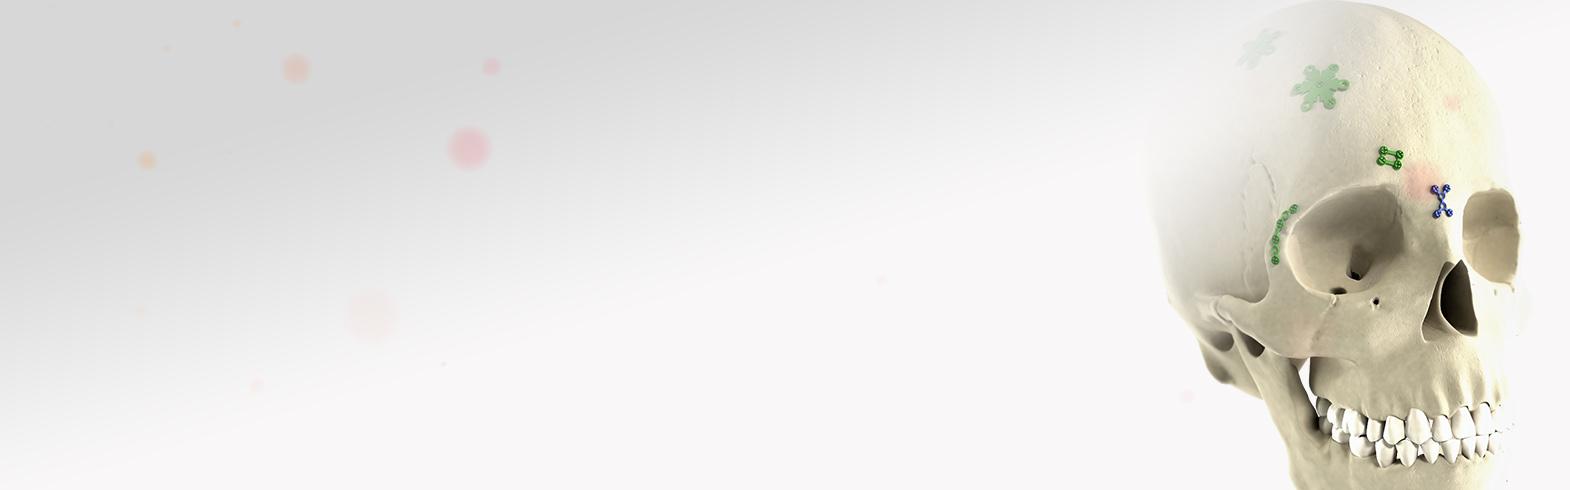 CMF-minitekmicrotek--Entête-2